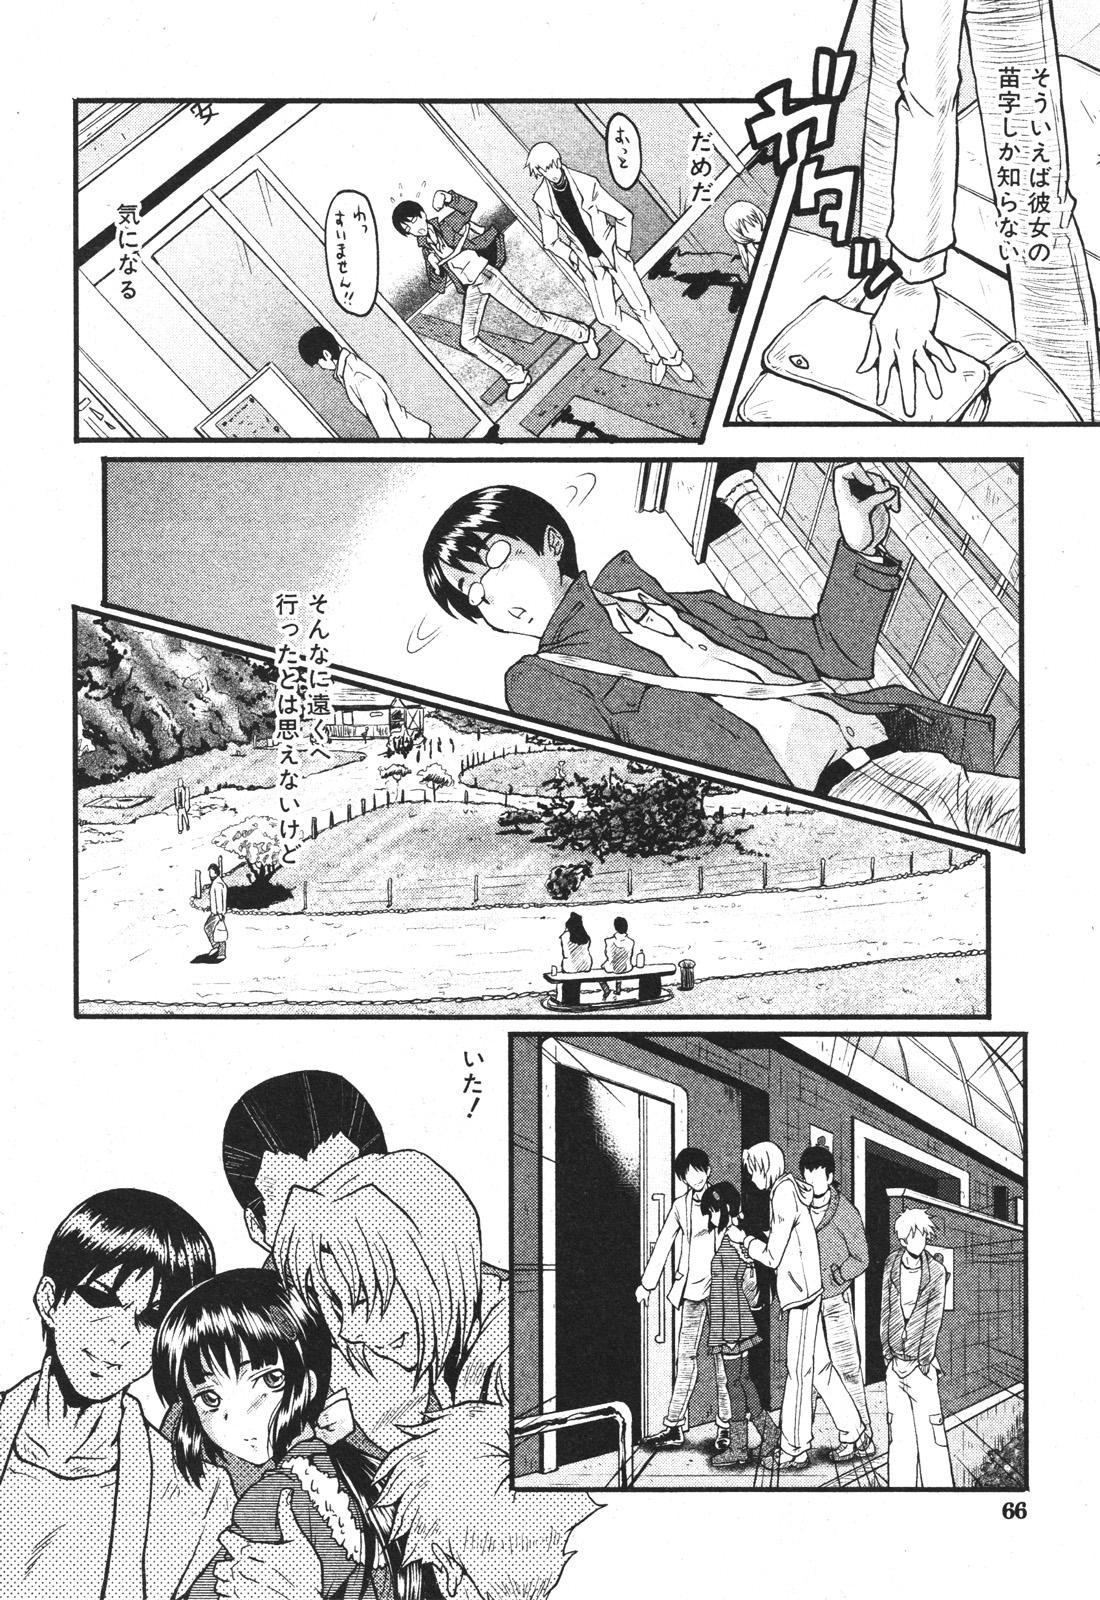 BUSTER COMIC 2010-05 Vol.07 64